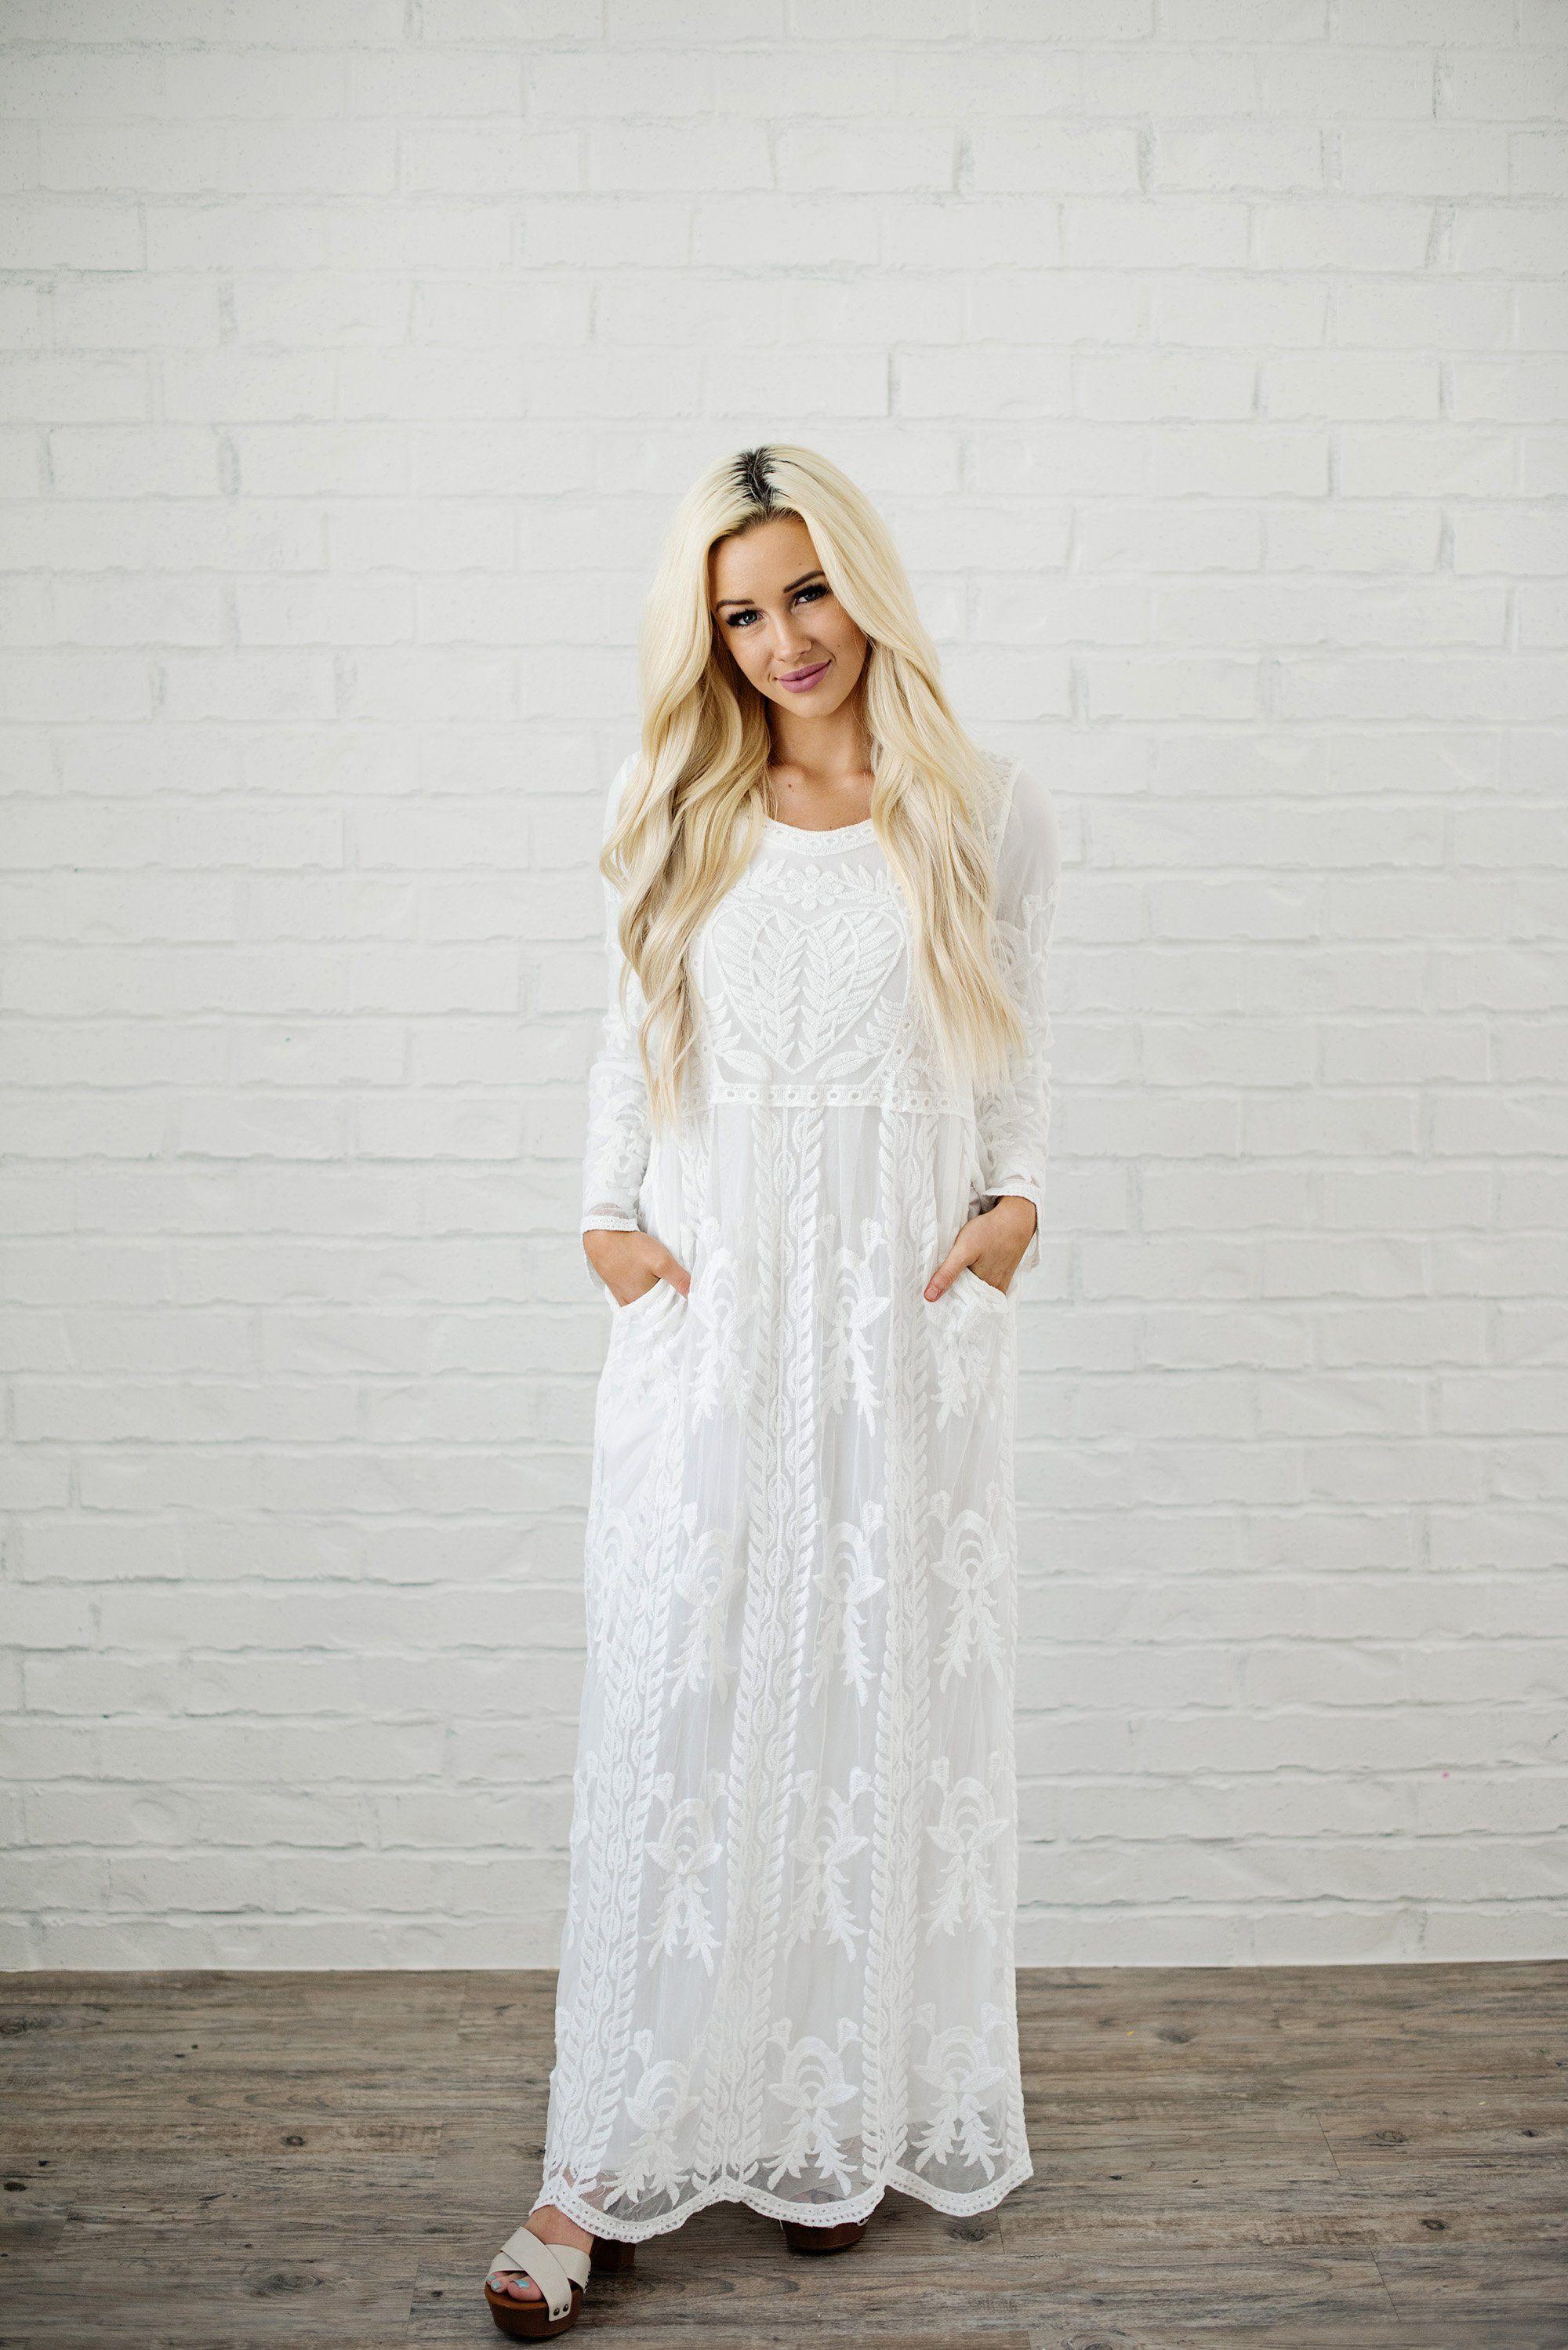 Cosette Lace Temple Dress Livy Kate Clothing Temple Dress White Lace Maxi Dress Lds Temple Dress [ 2997 x 2000 Pixel ]